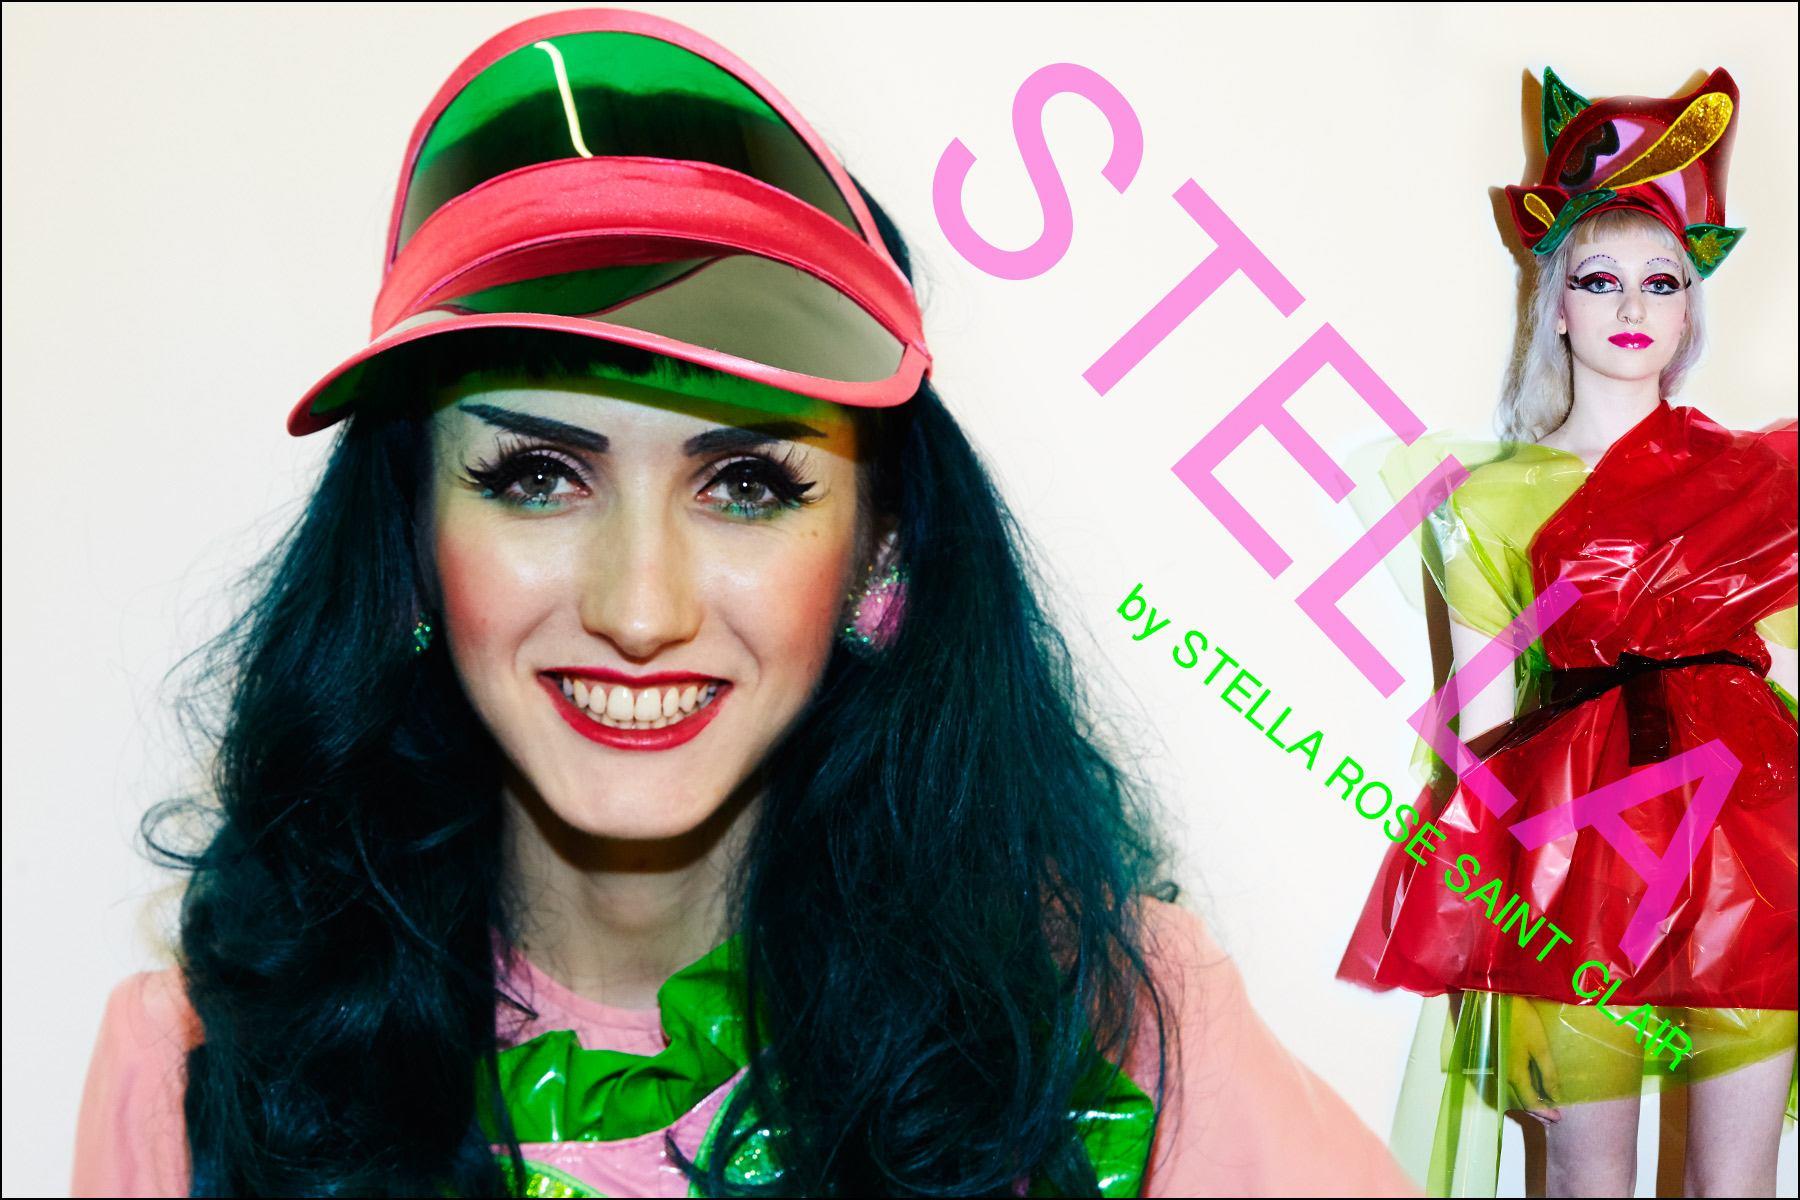 Stella. Hats by Stella Rose Saint Clair. Photography by Alexander Thompson for Ponyboy magazine NY.